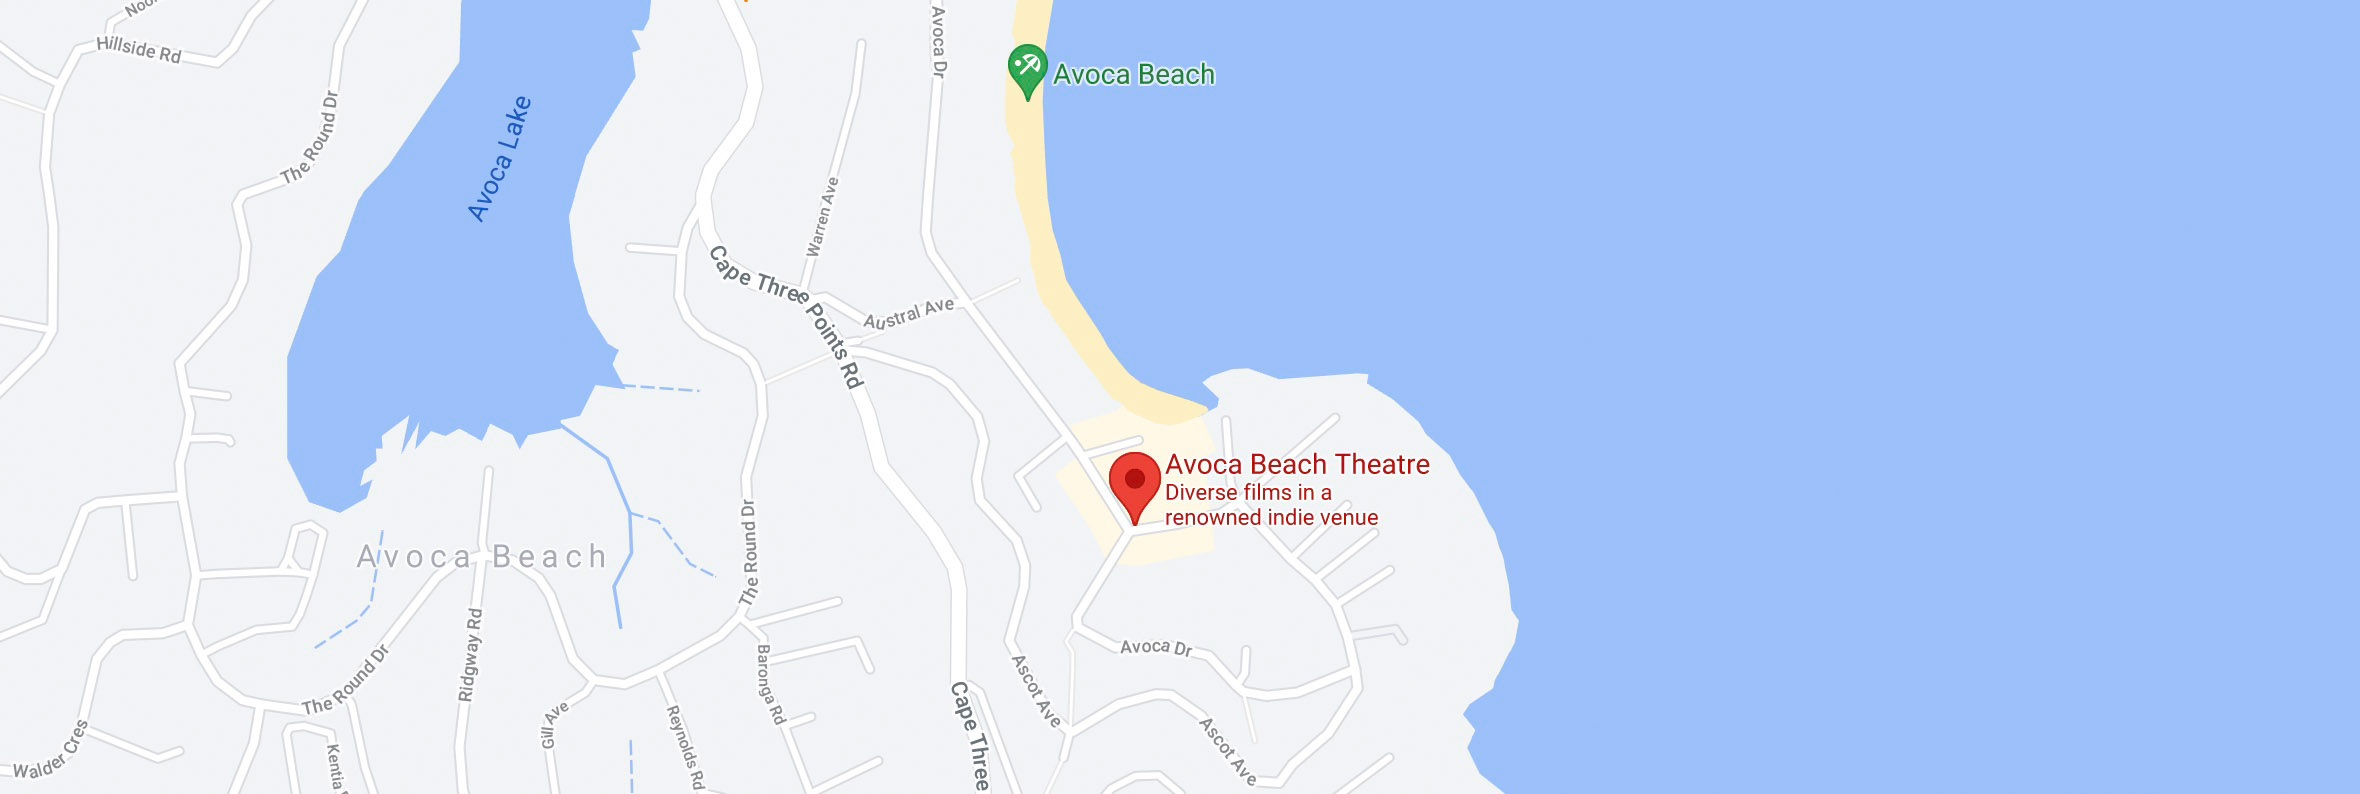 avoca beach theatre map new